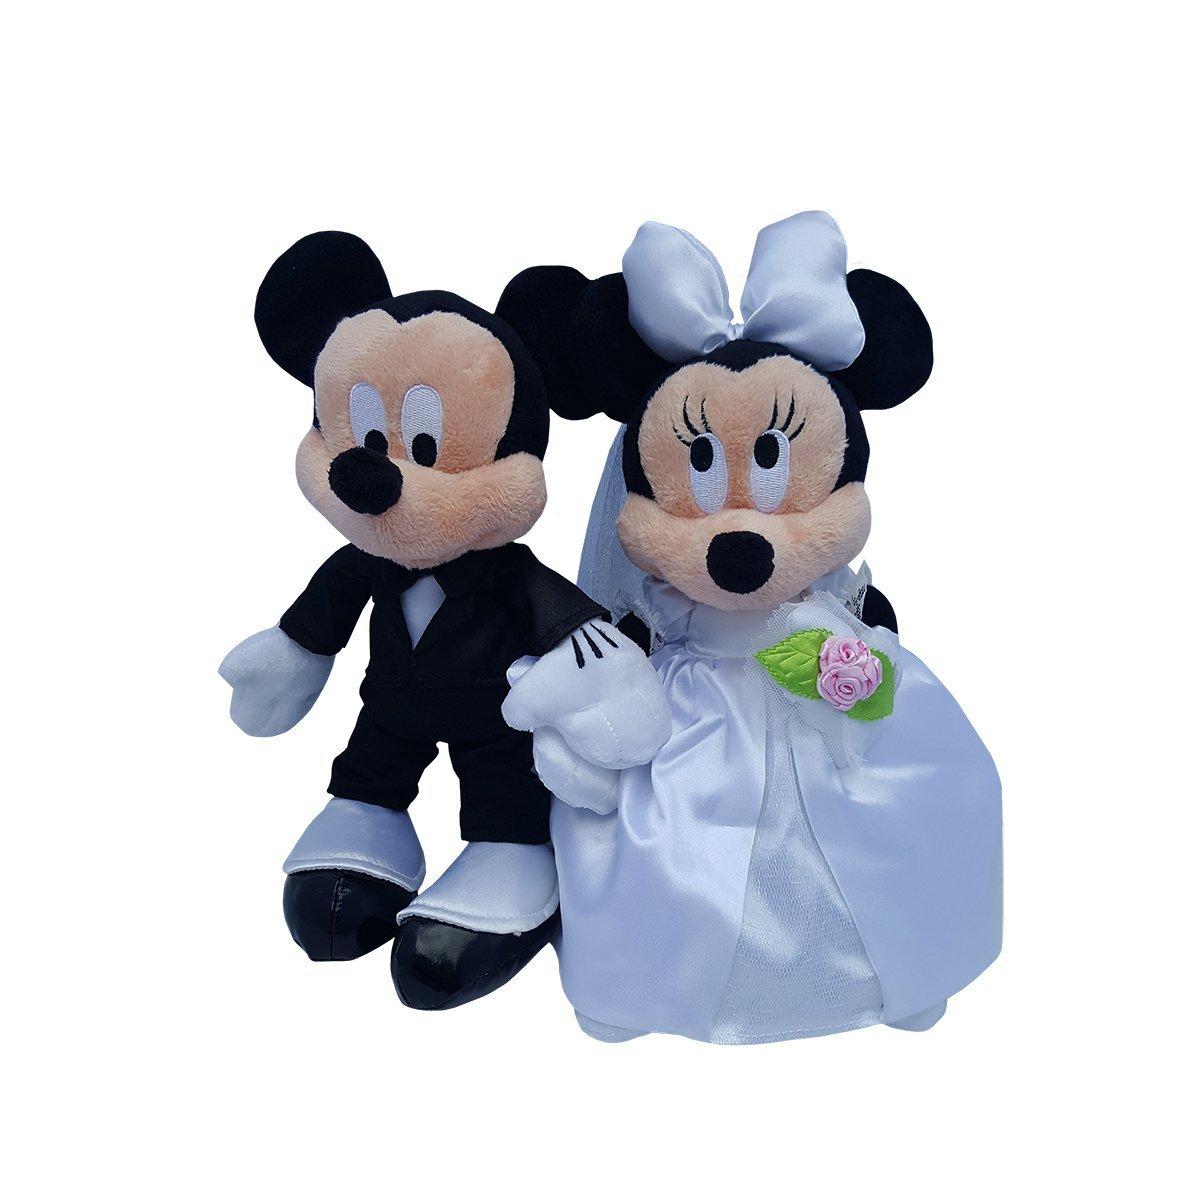 Disney Mickey Minnie Mouse Plush Wedding Set 9 Bride Groom In Price On M Alibaba